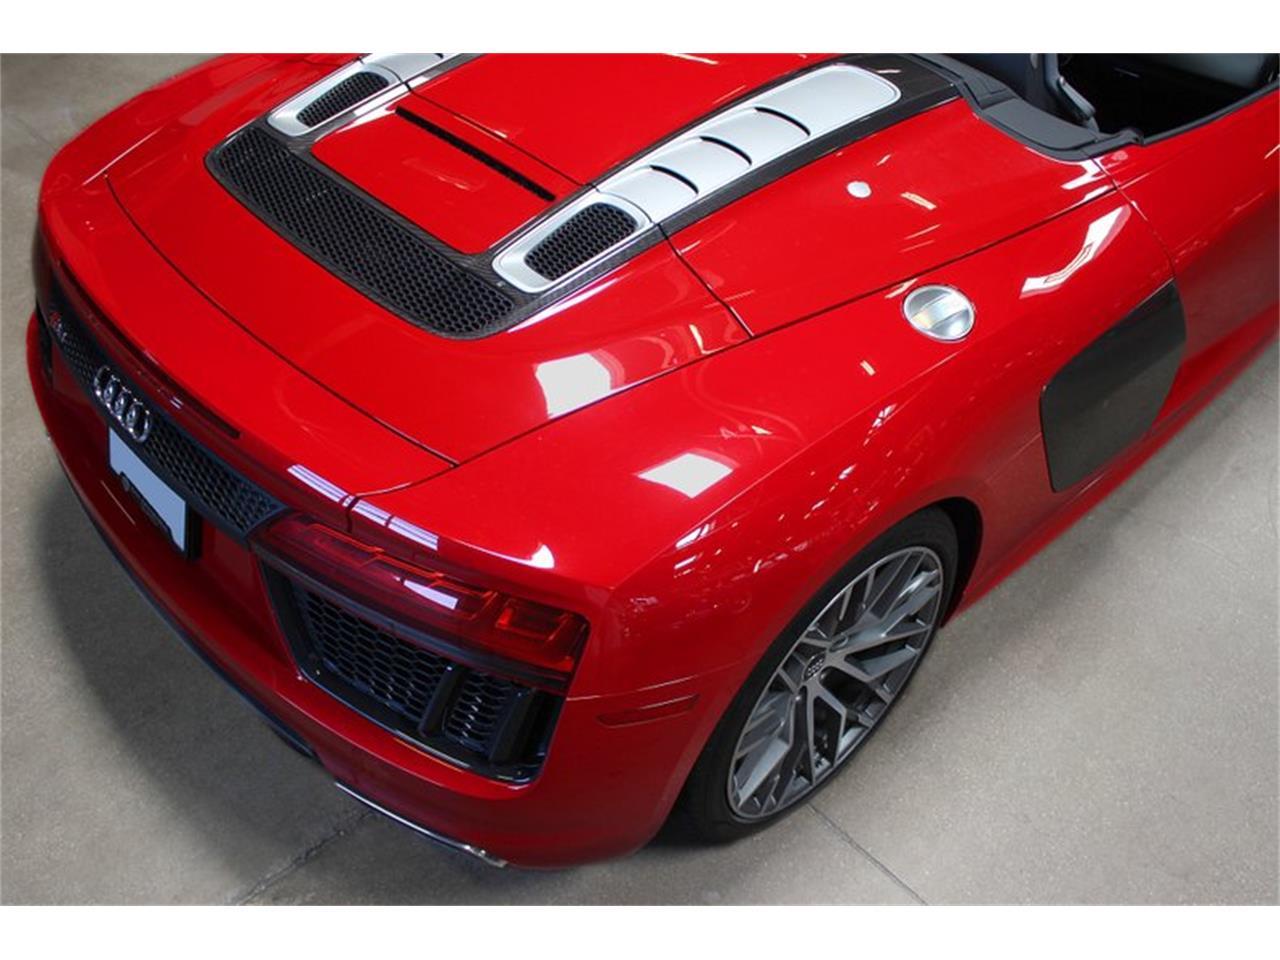 Large Picture of '17 Audi R8 located in San Carlos California - QCOX